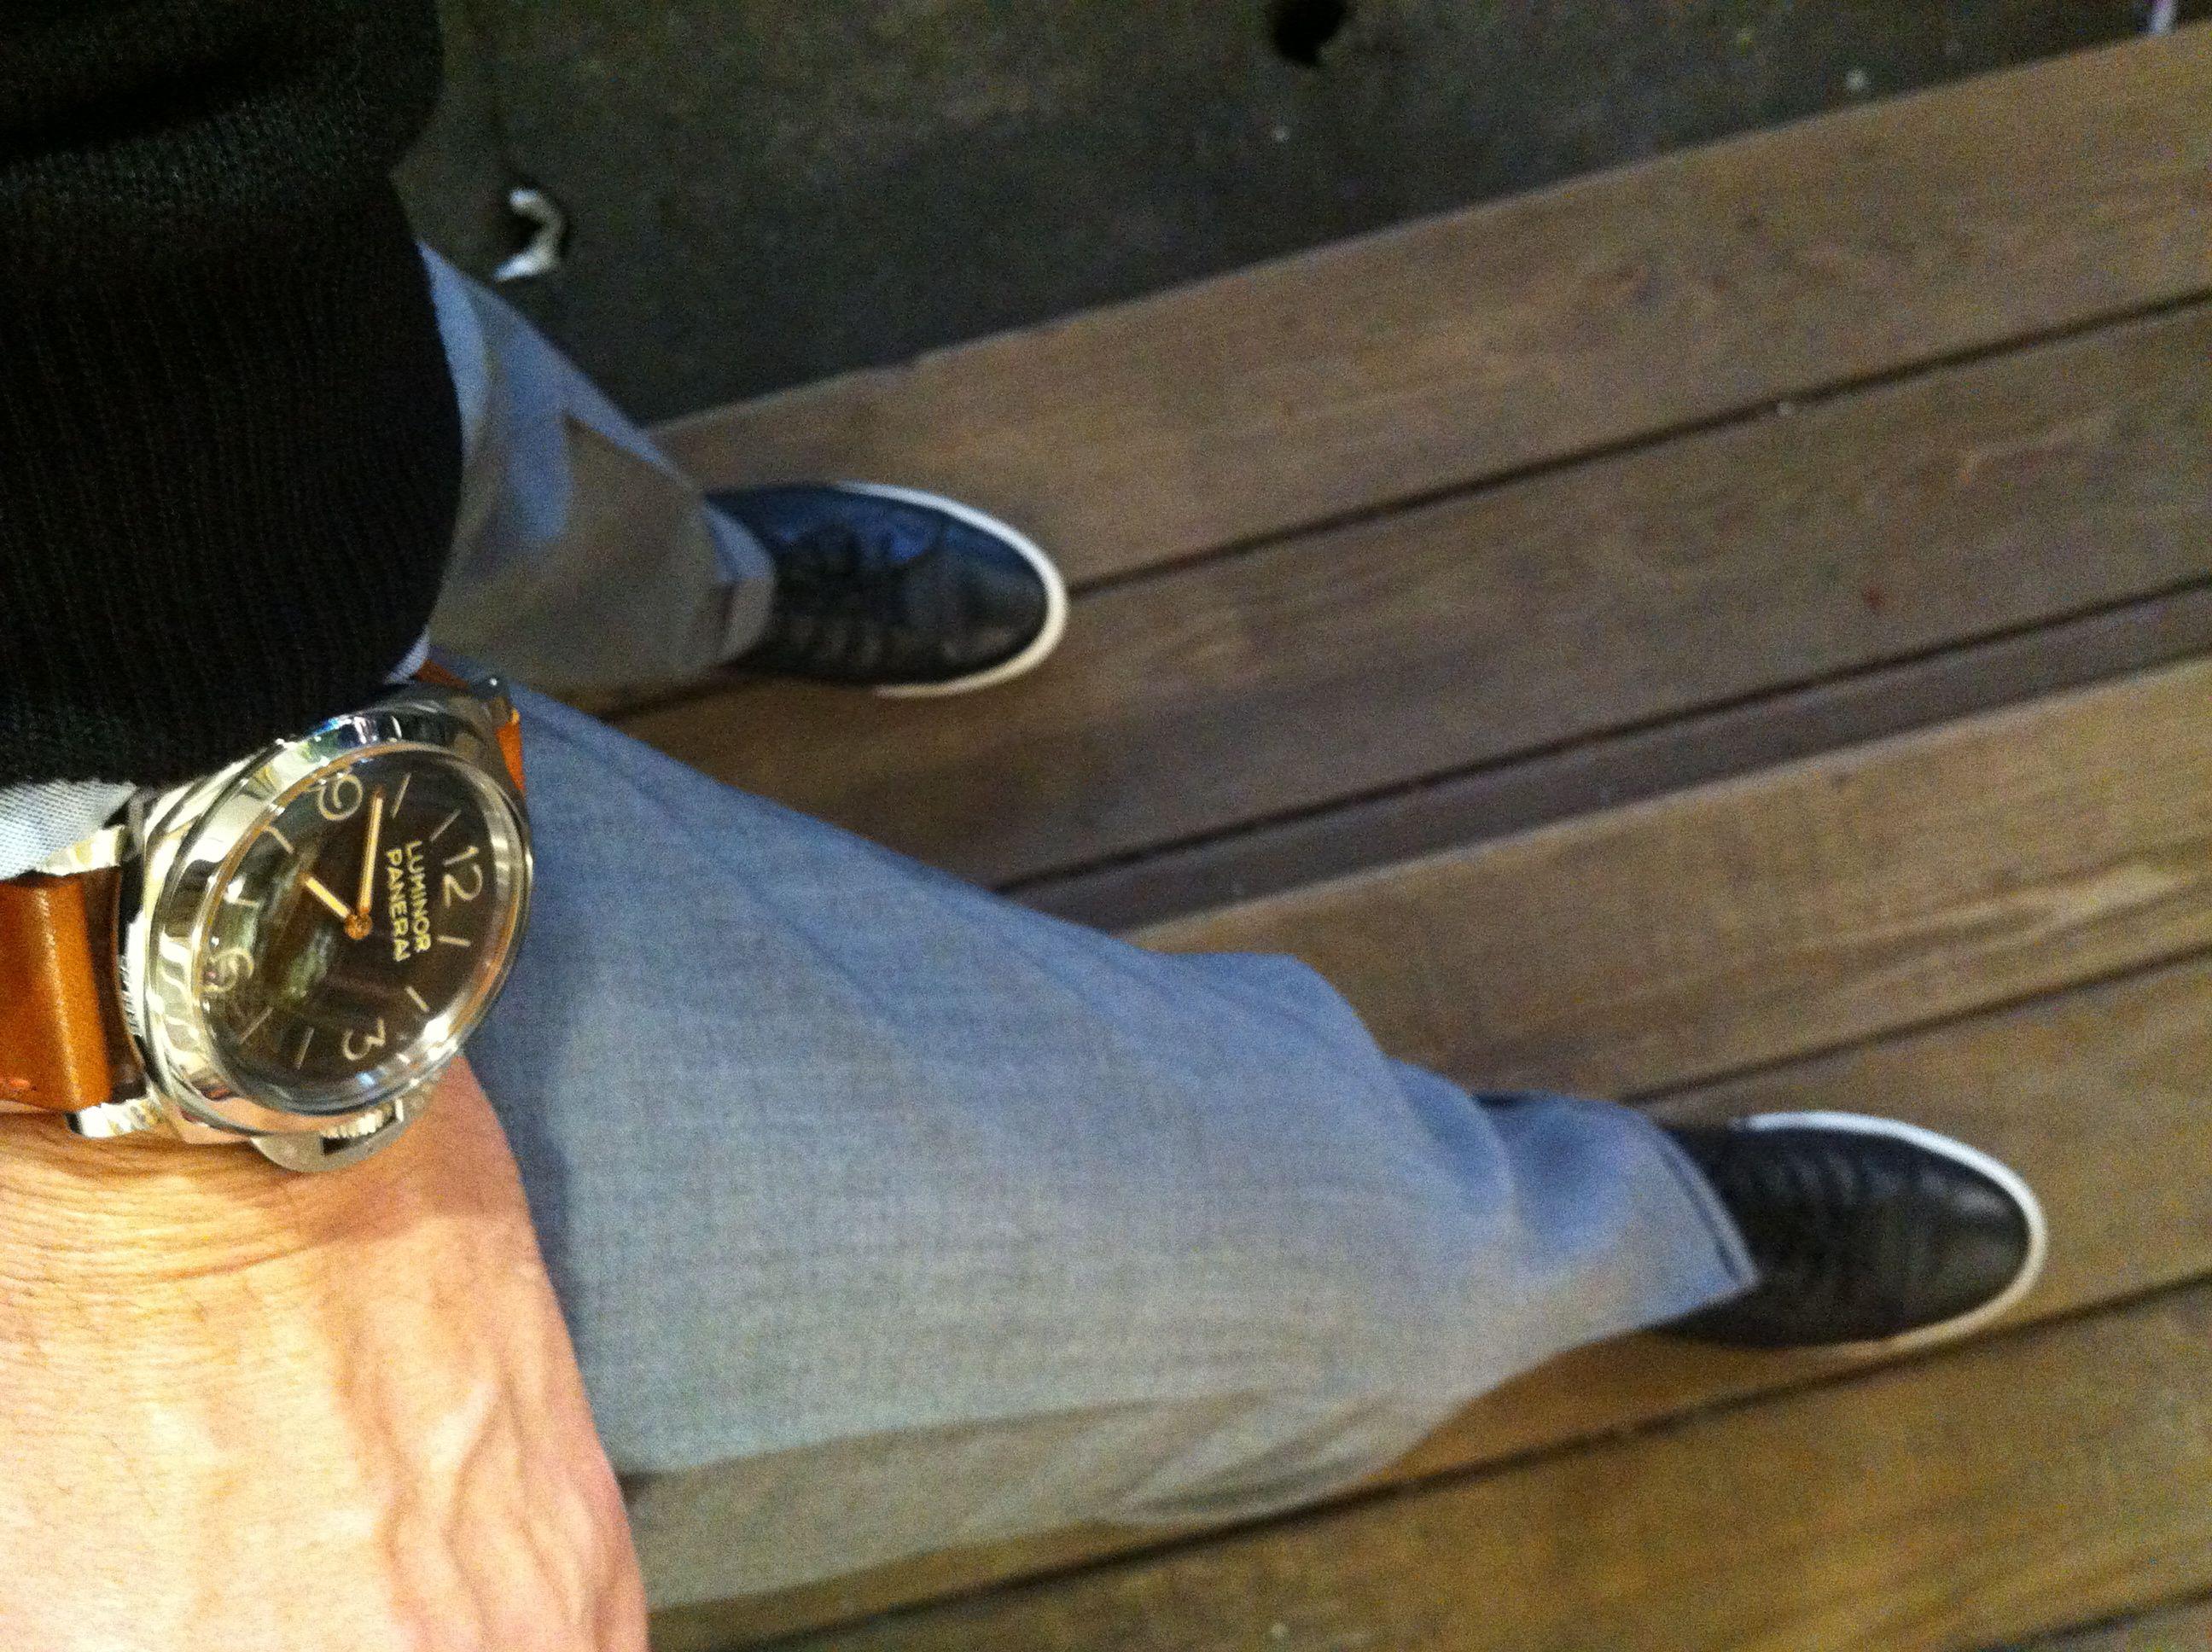 Panerai 372 on Carmel Toshi strap, Paul Smith slacks ...